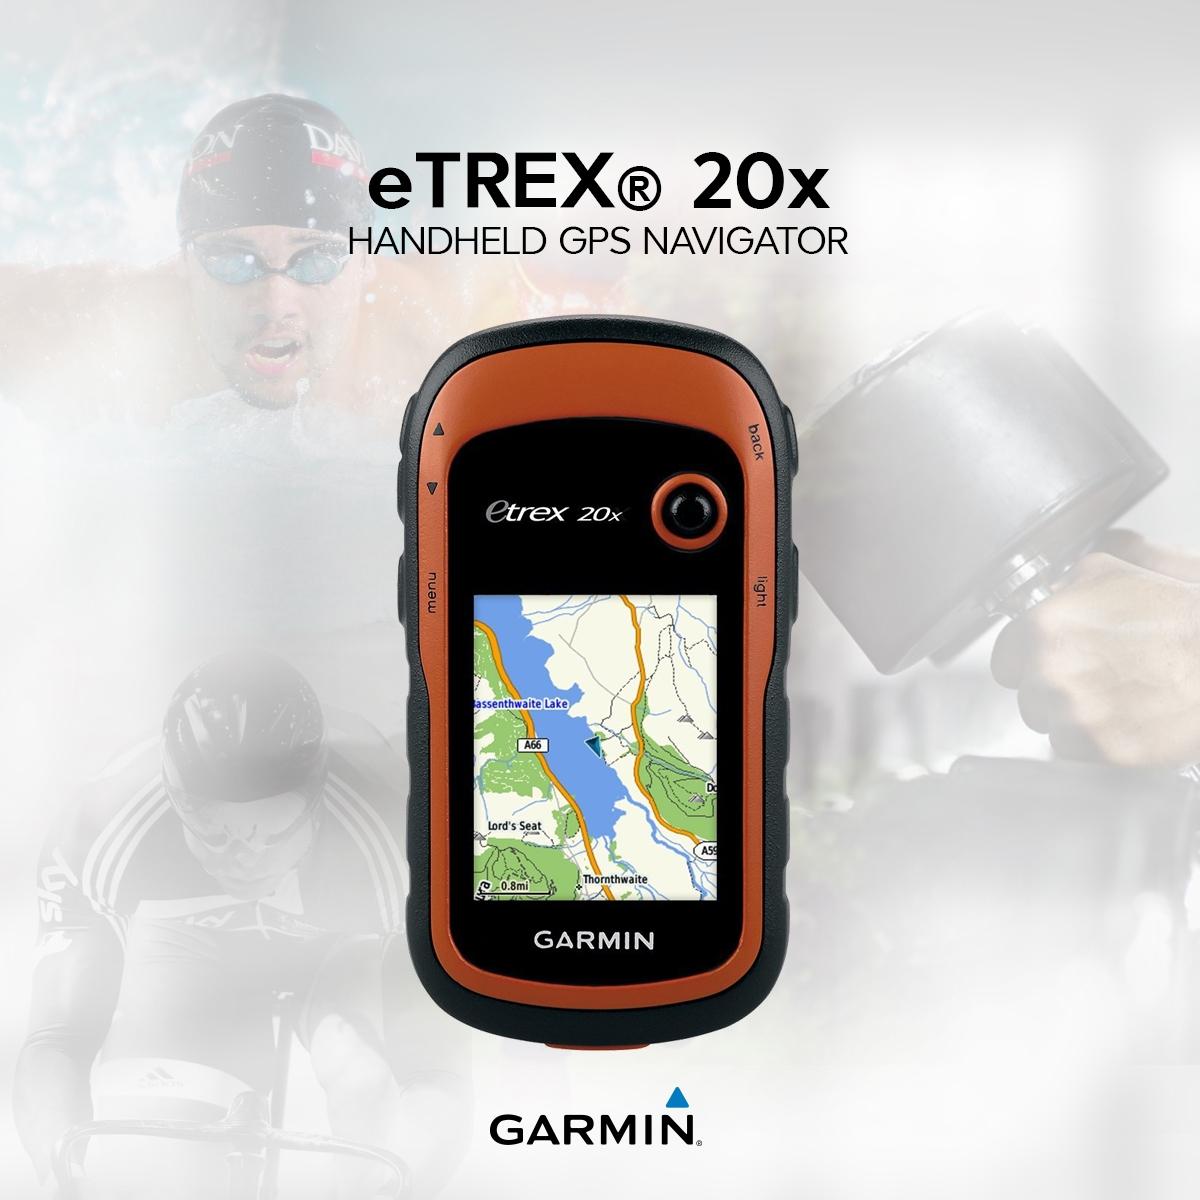 Garmin etrex 20x how to use